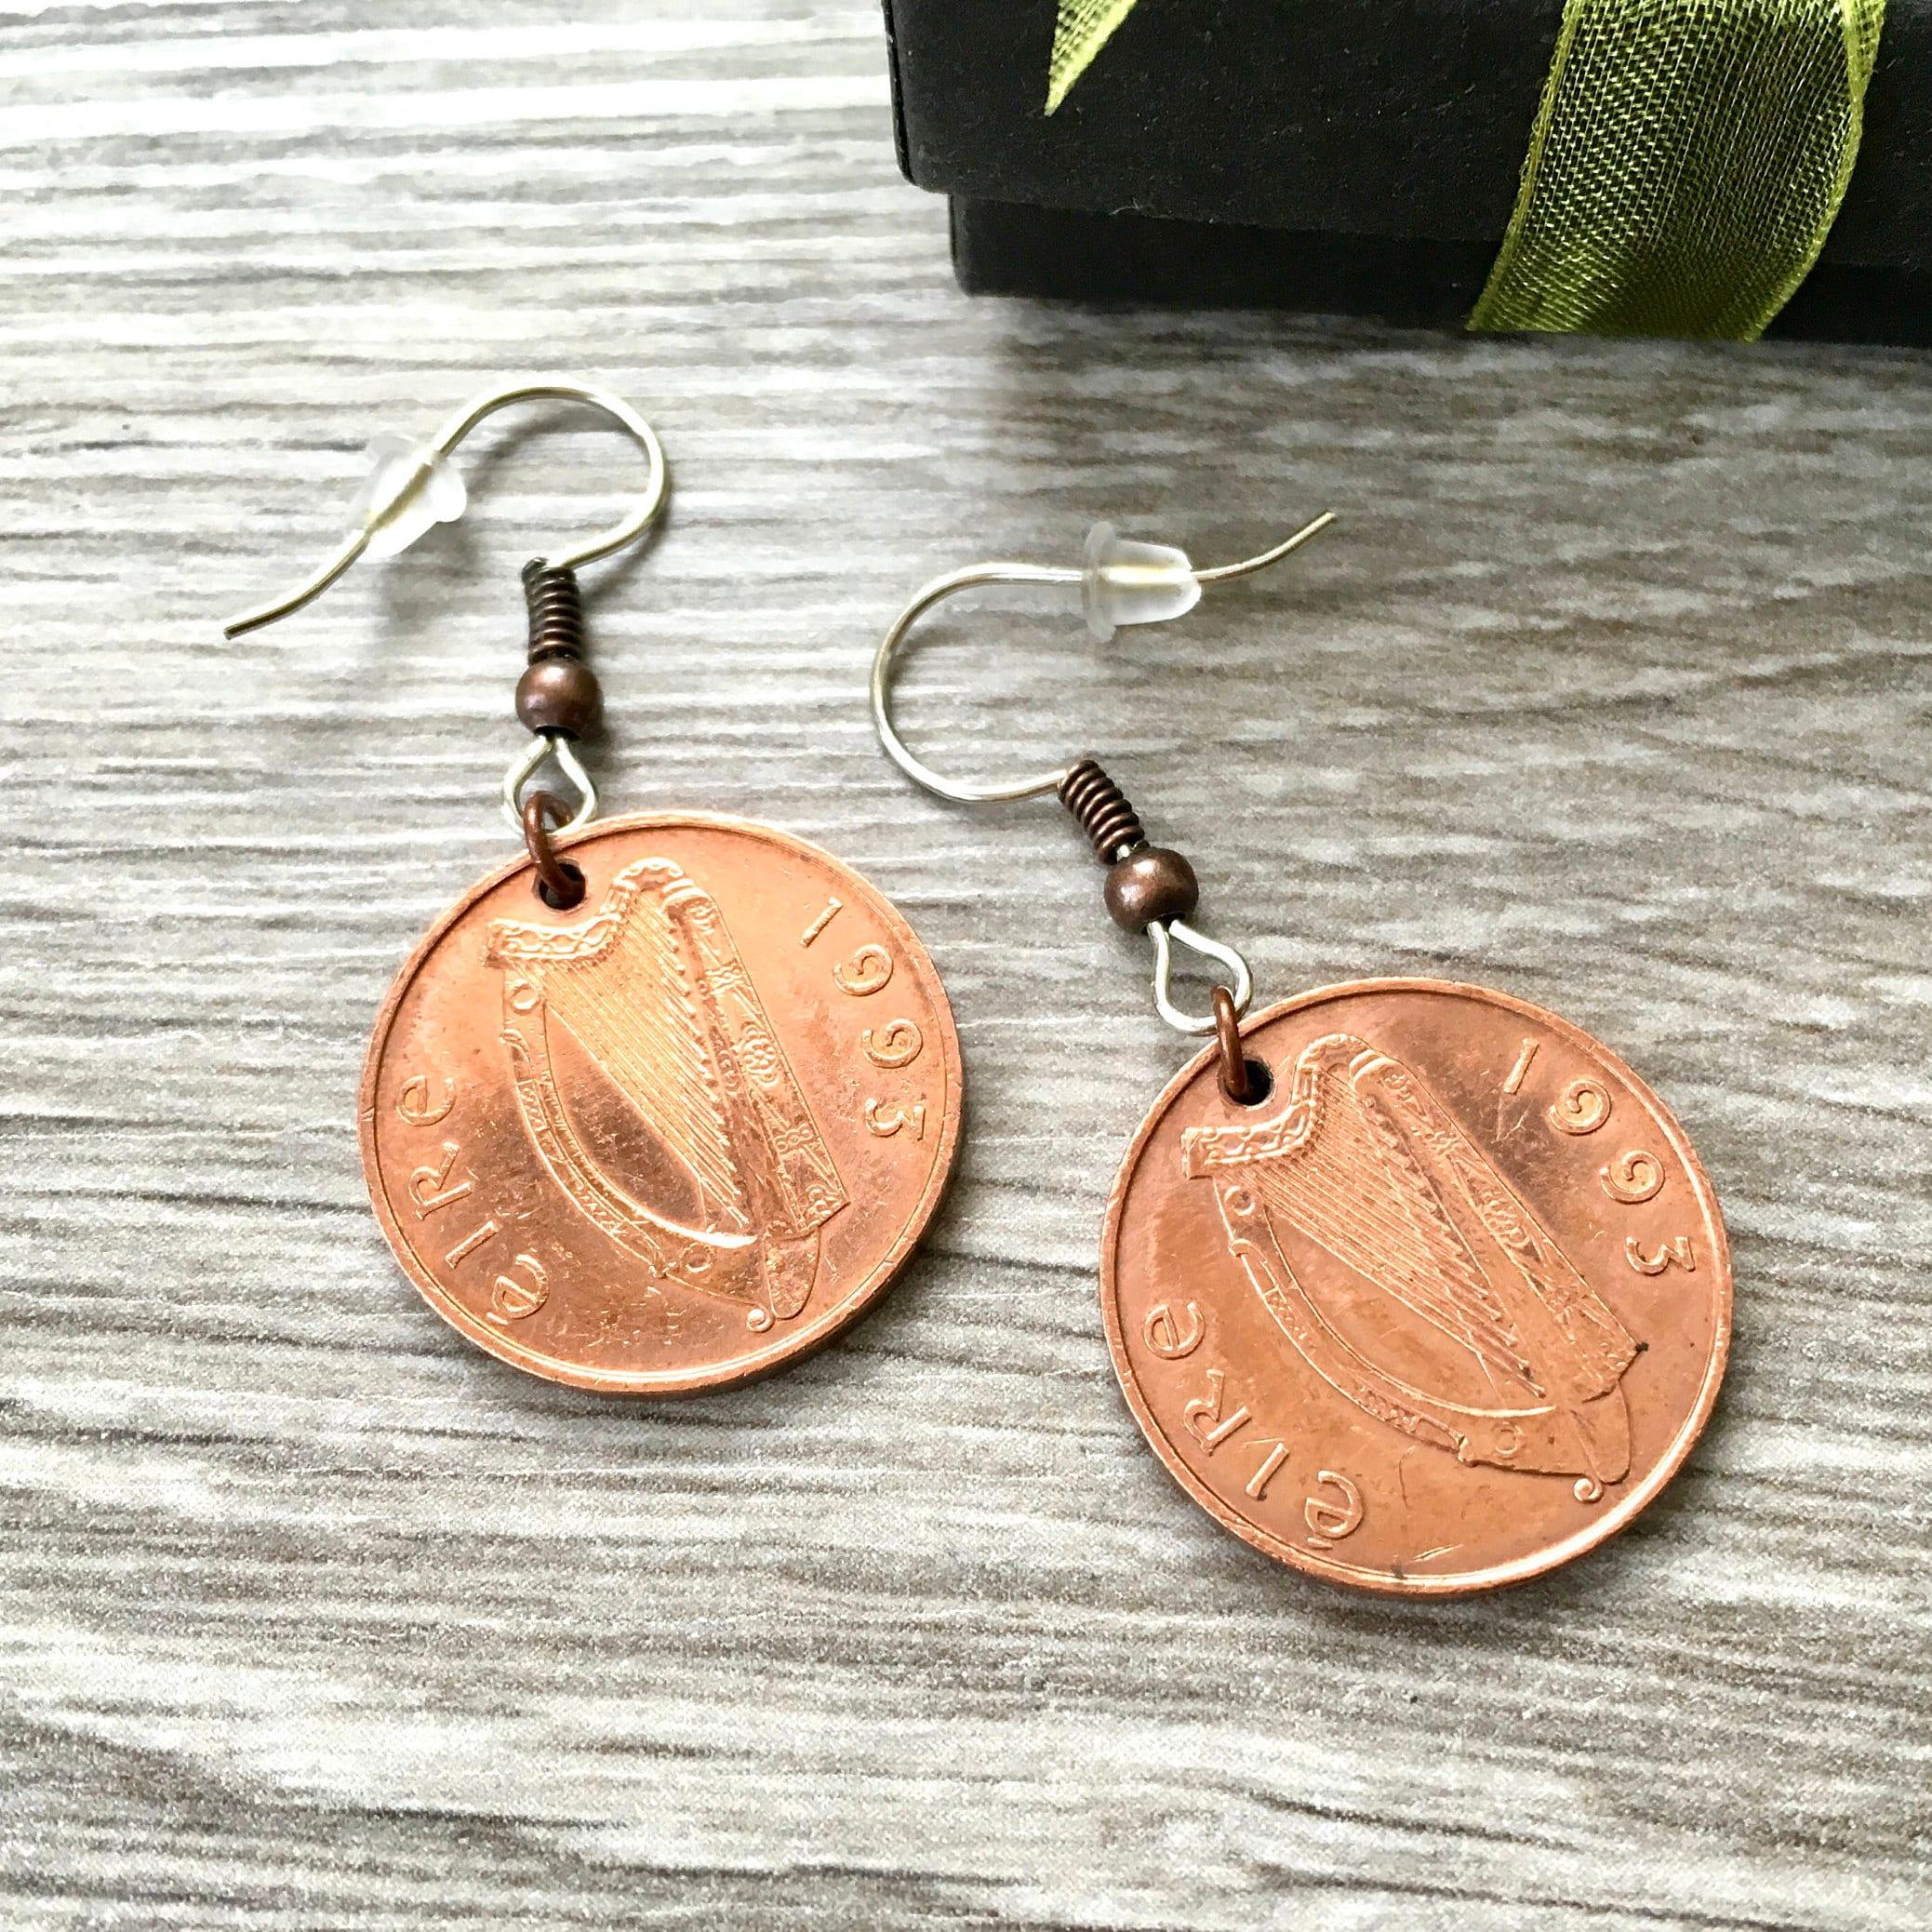 Irish coin earrings vintage 1993 penny earrings lucky Irish